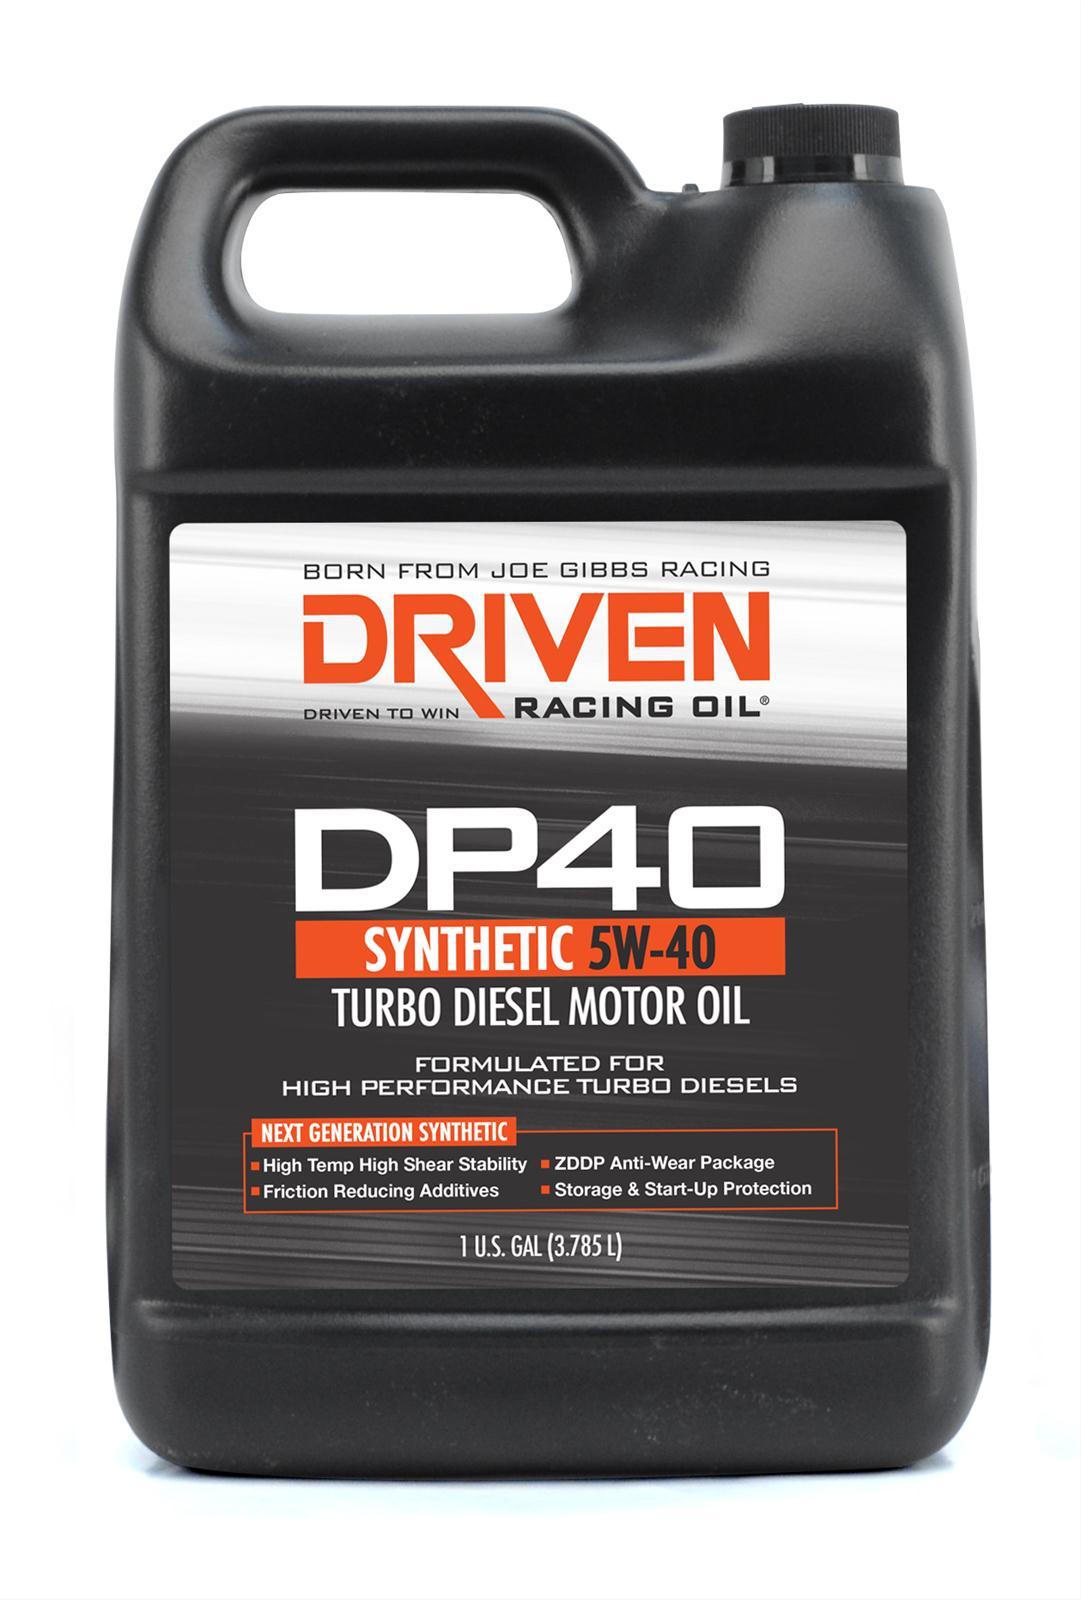 Joe Gibbs Racing Oil Motor Oil Dp40 Synthetic 5w40 1 Gallon Each Ebay